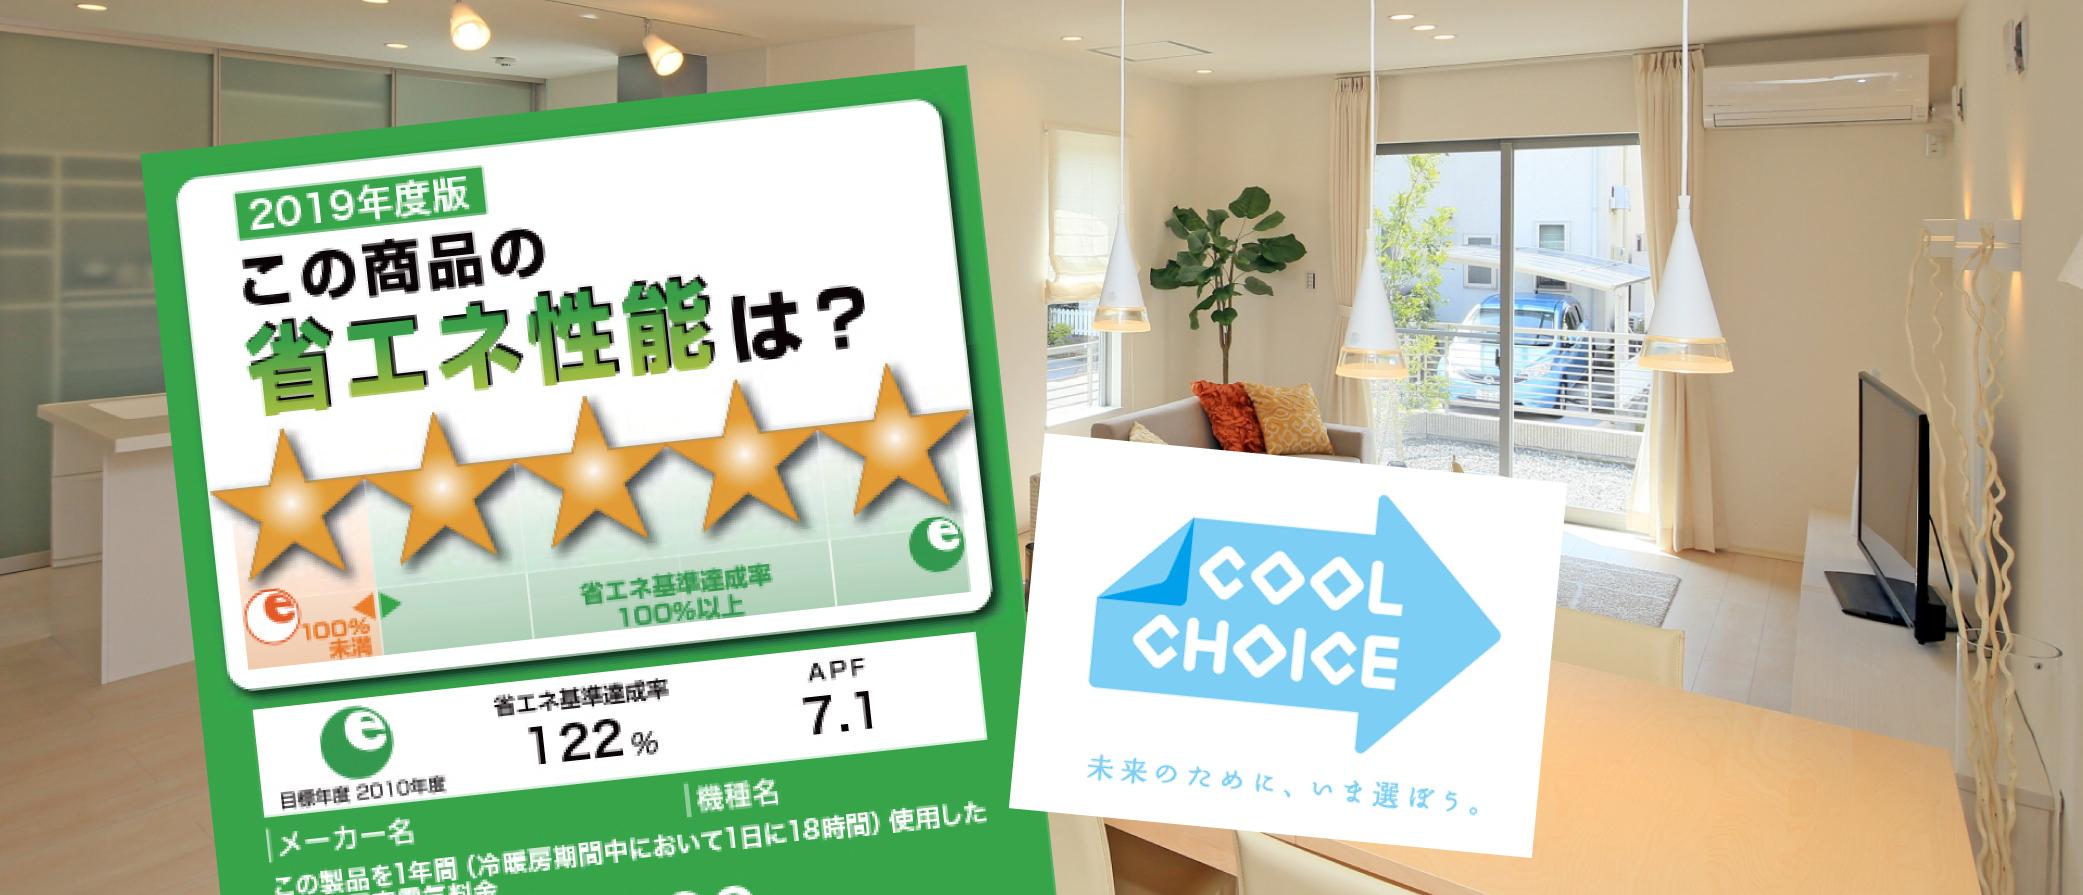 Energy saving performance